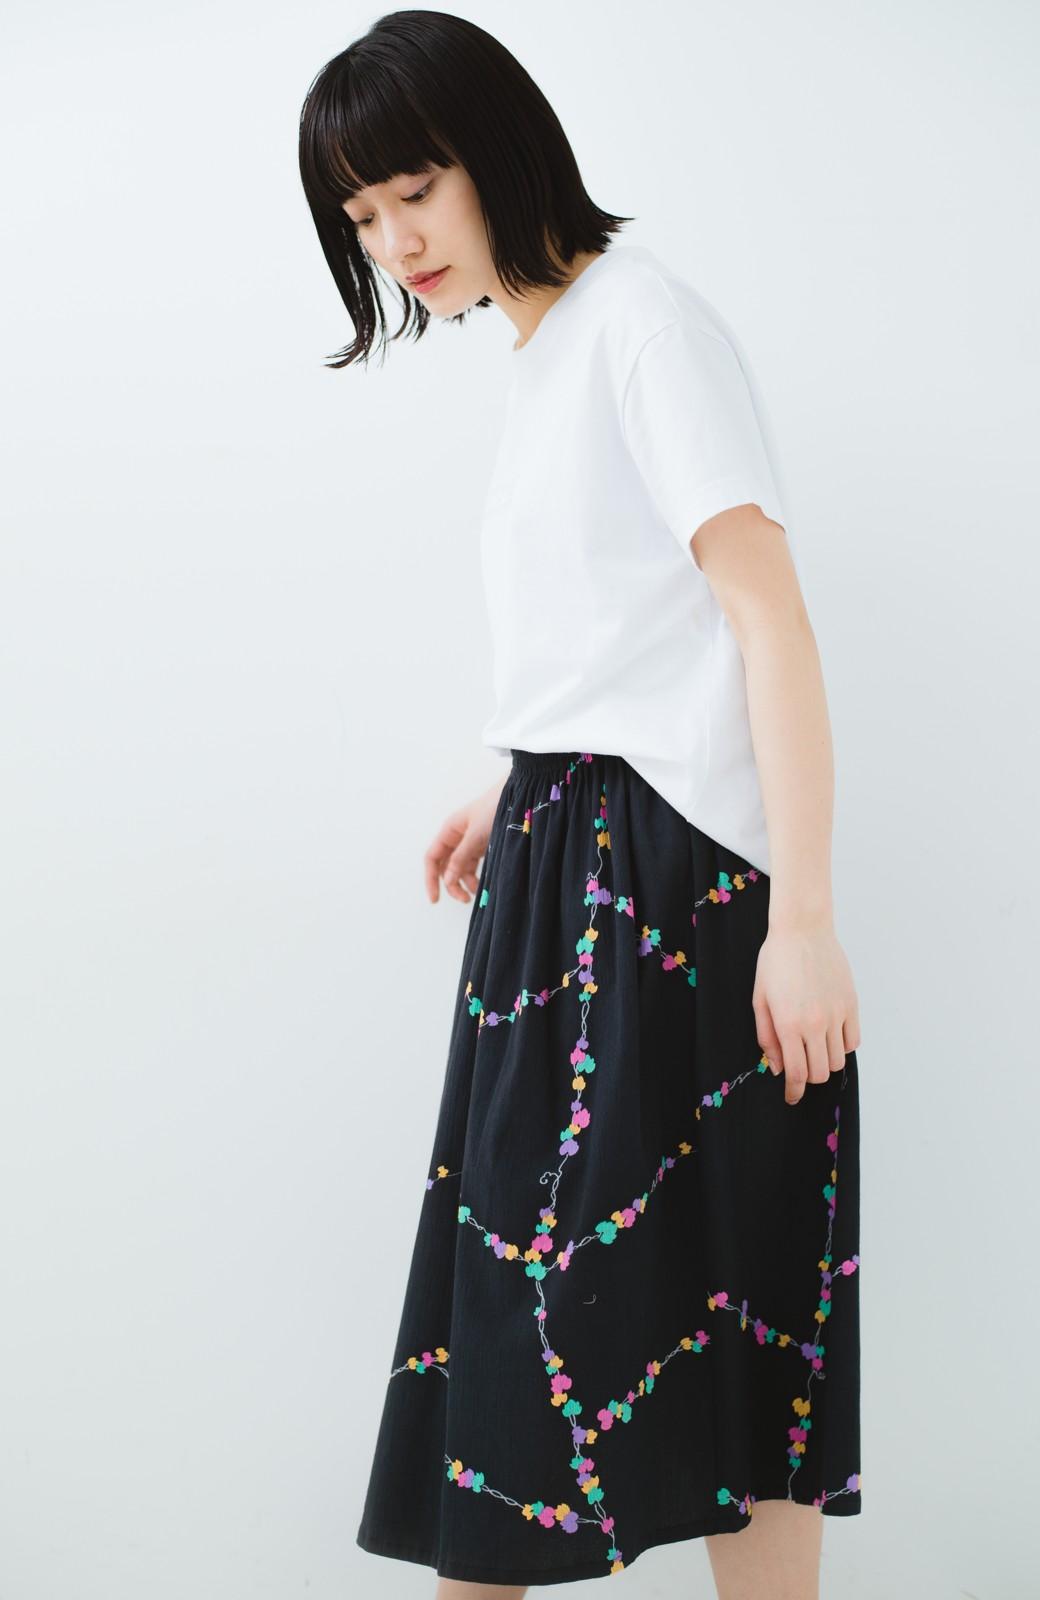 haco! 京都の浴衣屋さんと作った浴衣生地のスカート <ブラック系その他>の商品写真19